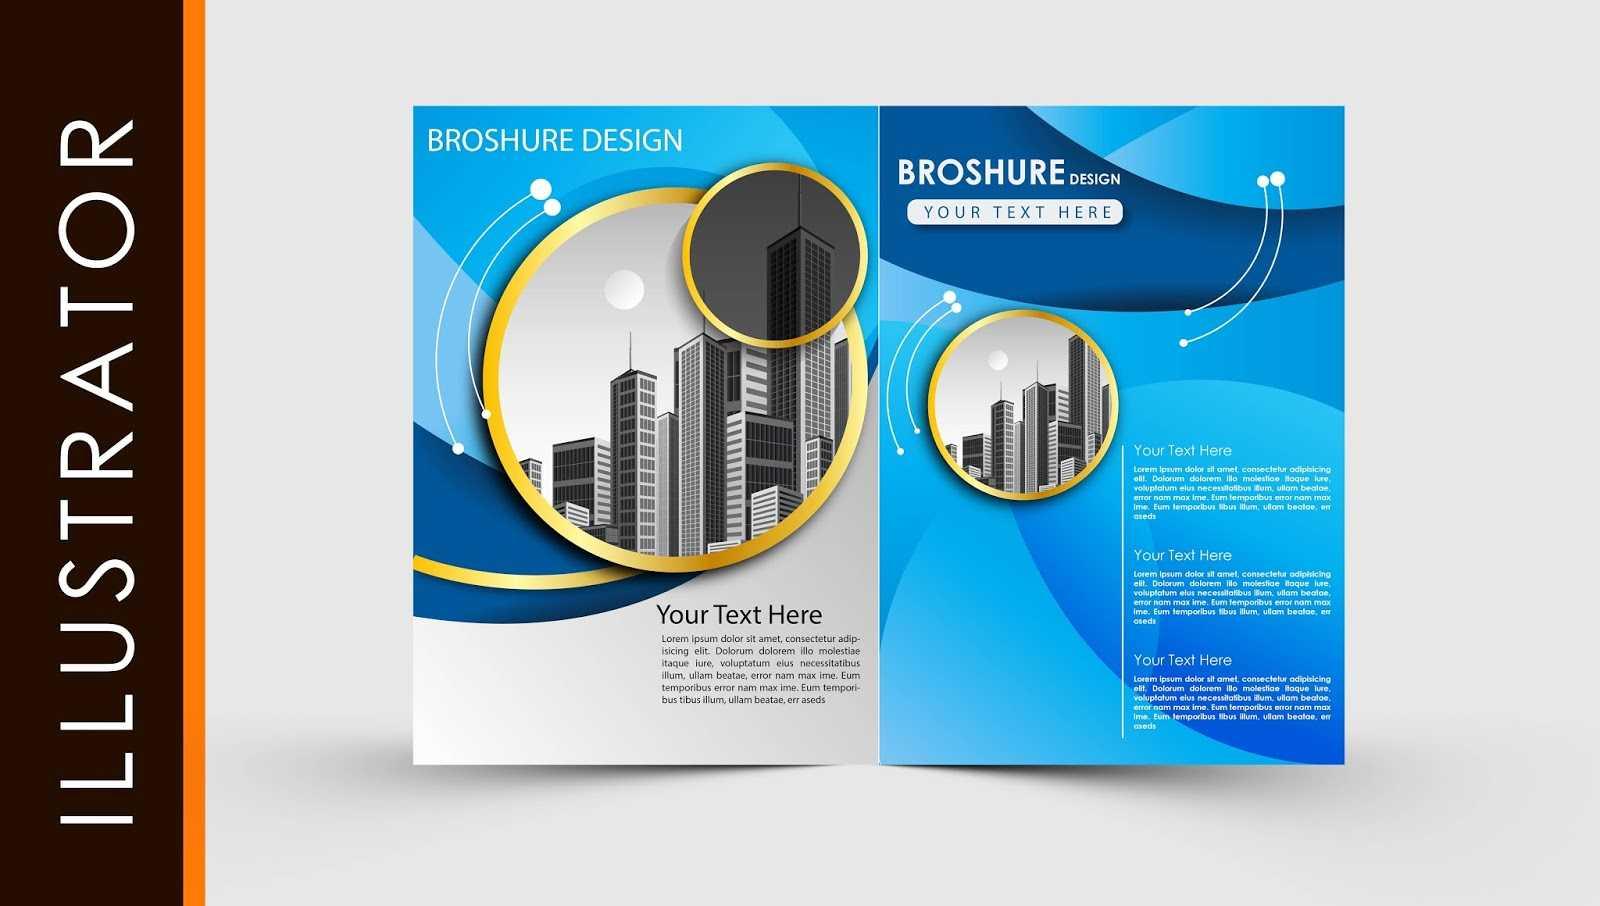 Free Download Adobe Illustrator Template Brochure Two Fold Regarding Brochure Templates Ai Free Download